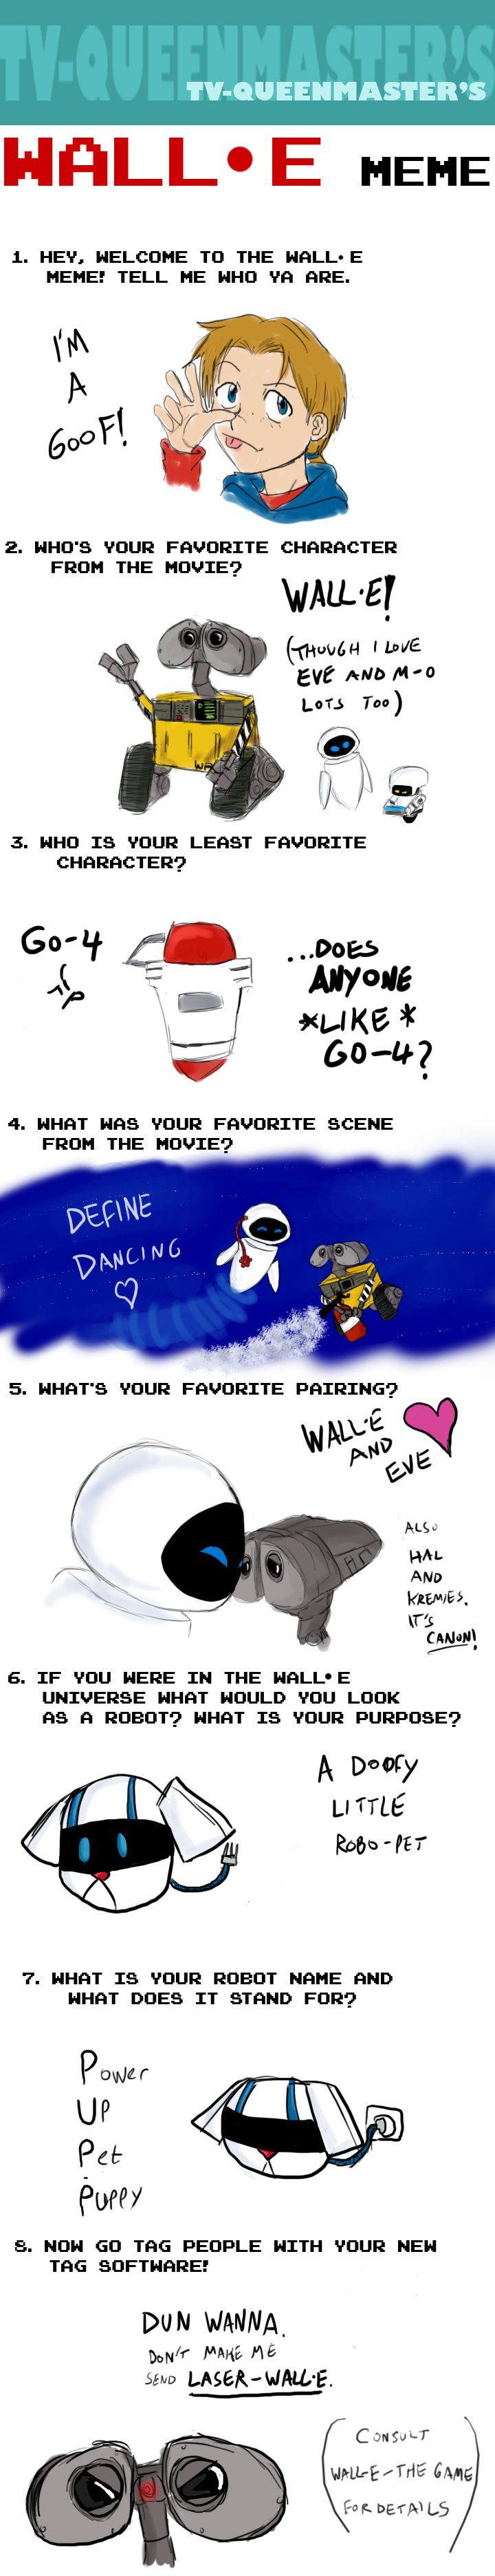 Wall e movie #Wall_e | #Pixar_filme | #Disney_anime_stil | #Humanisierte_disney | #WALL_E_Eve | #moviesputlockerme